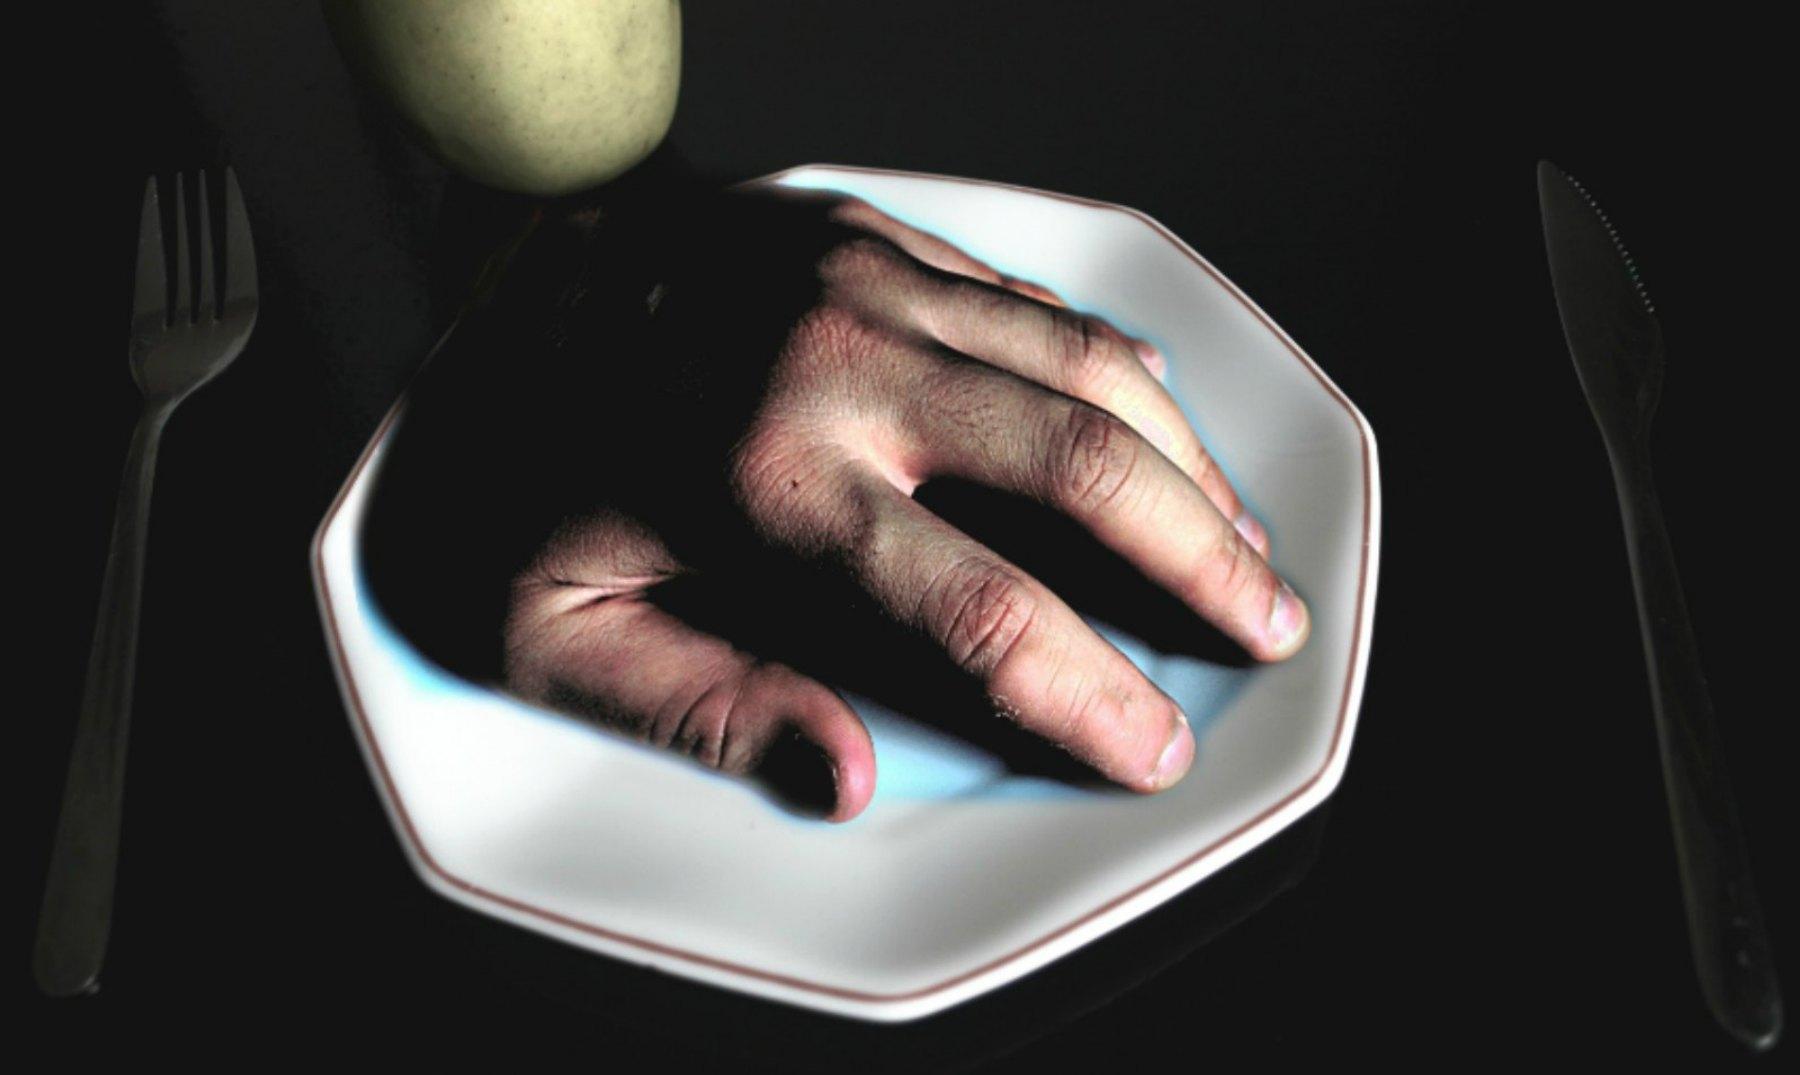 Armin Meiwes: el caníbal alemán